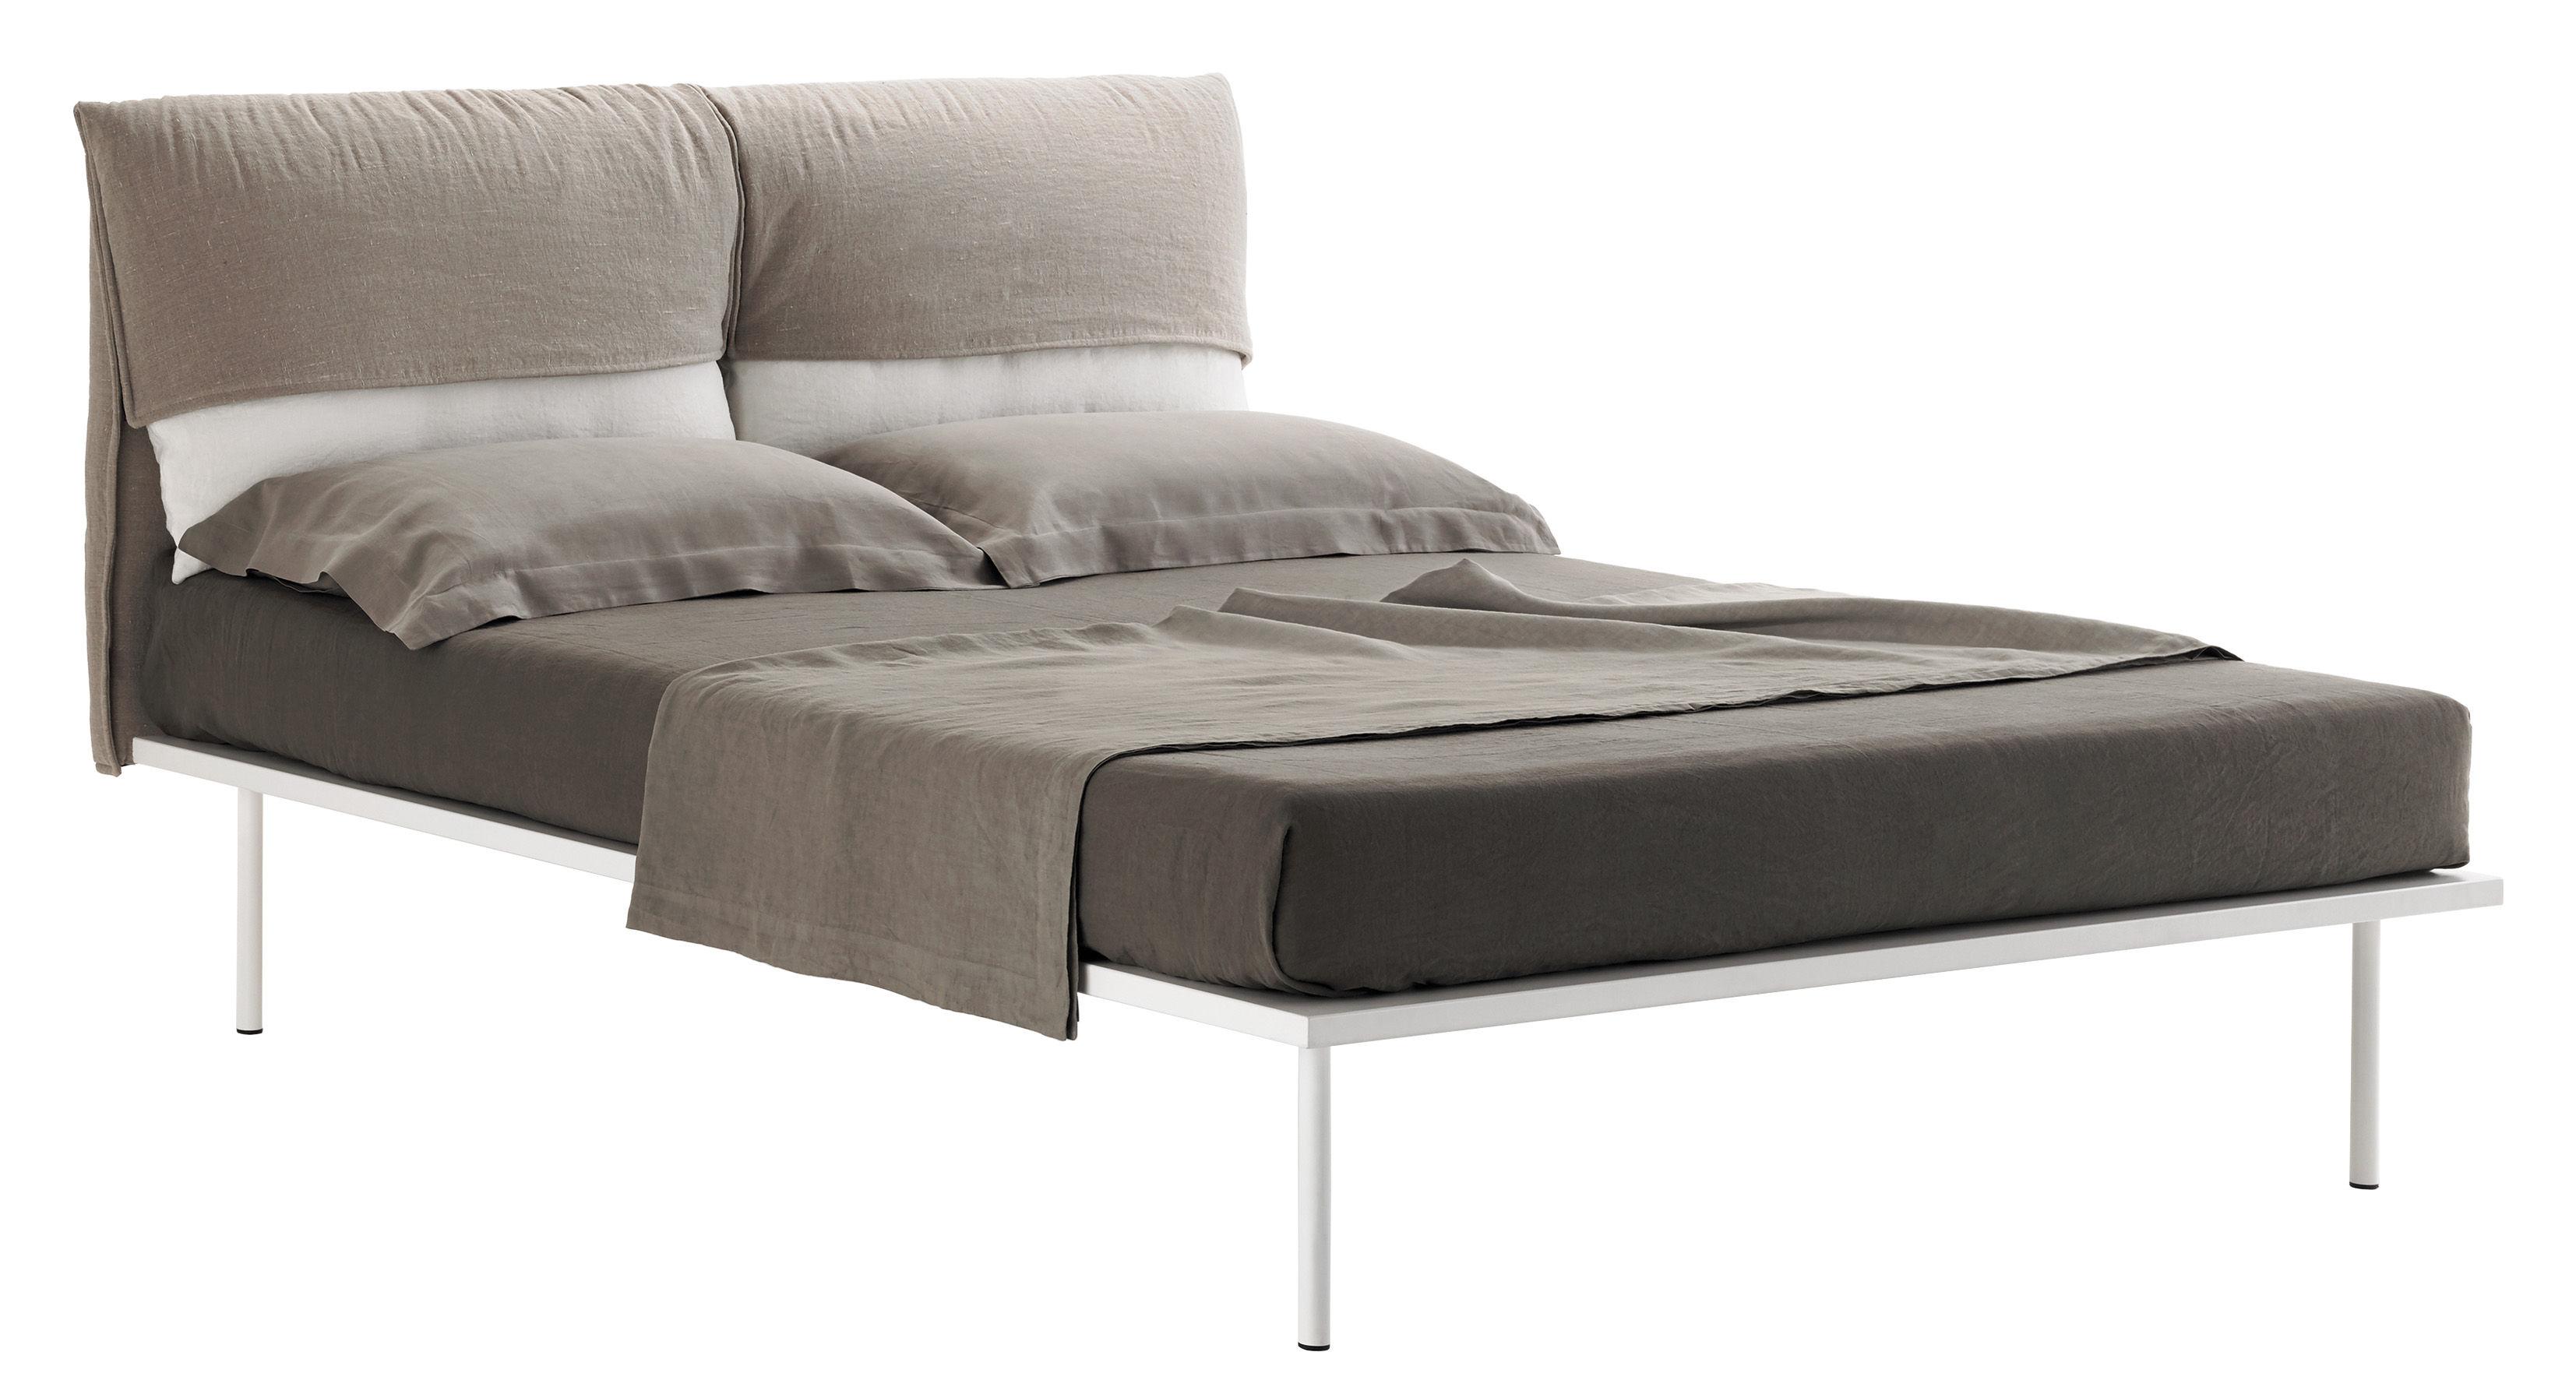 lit double coverbed 176 x 213 cm blanc tissu taupe zanotta. Black Bedroom Furniture Sets. Home Design Ideas